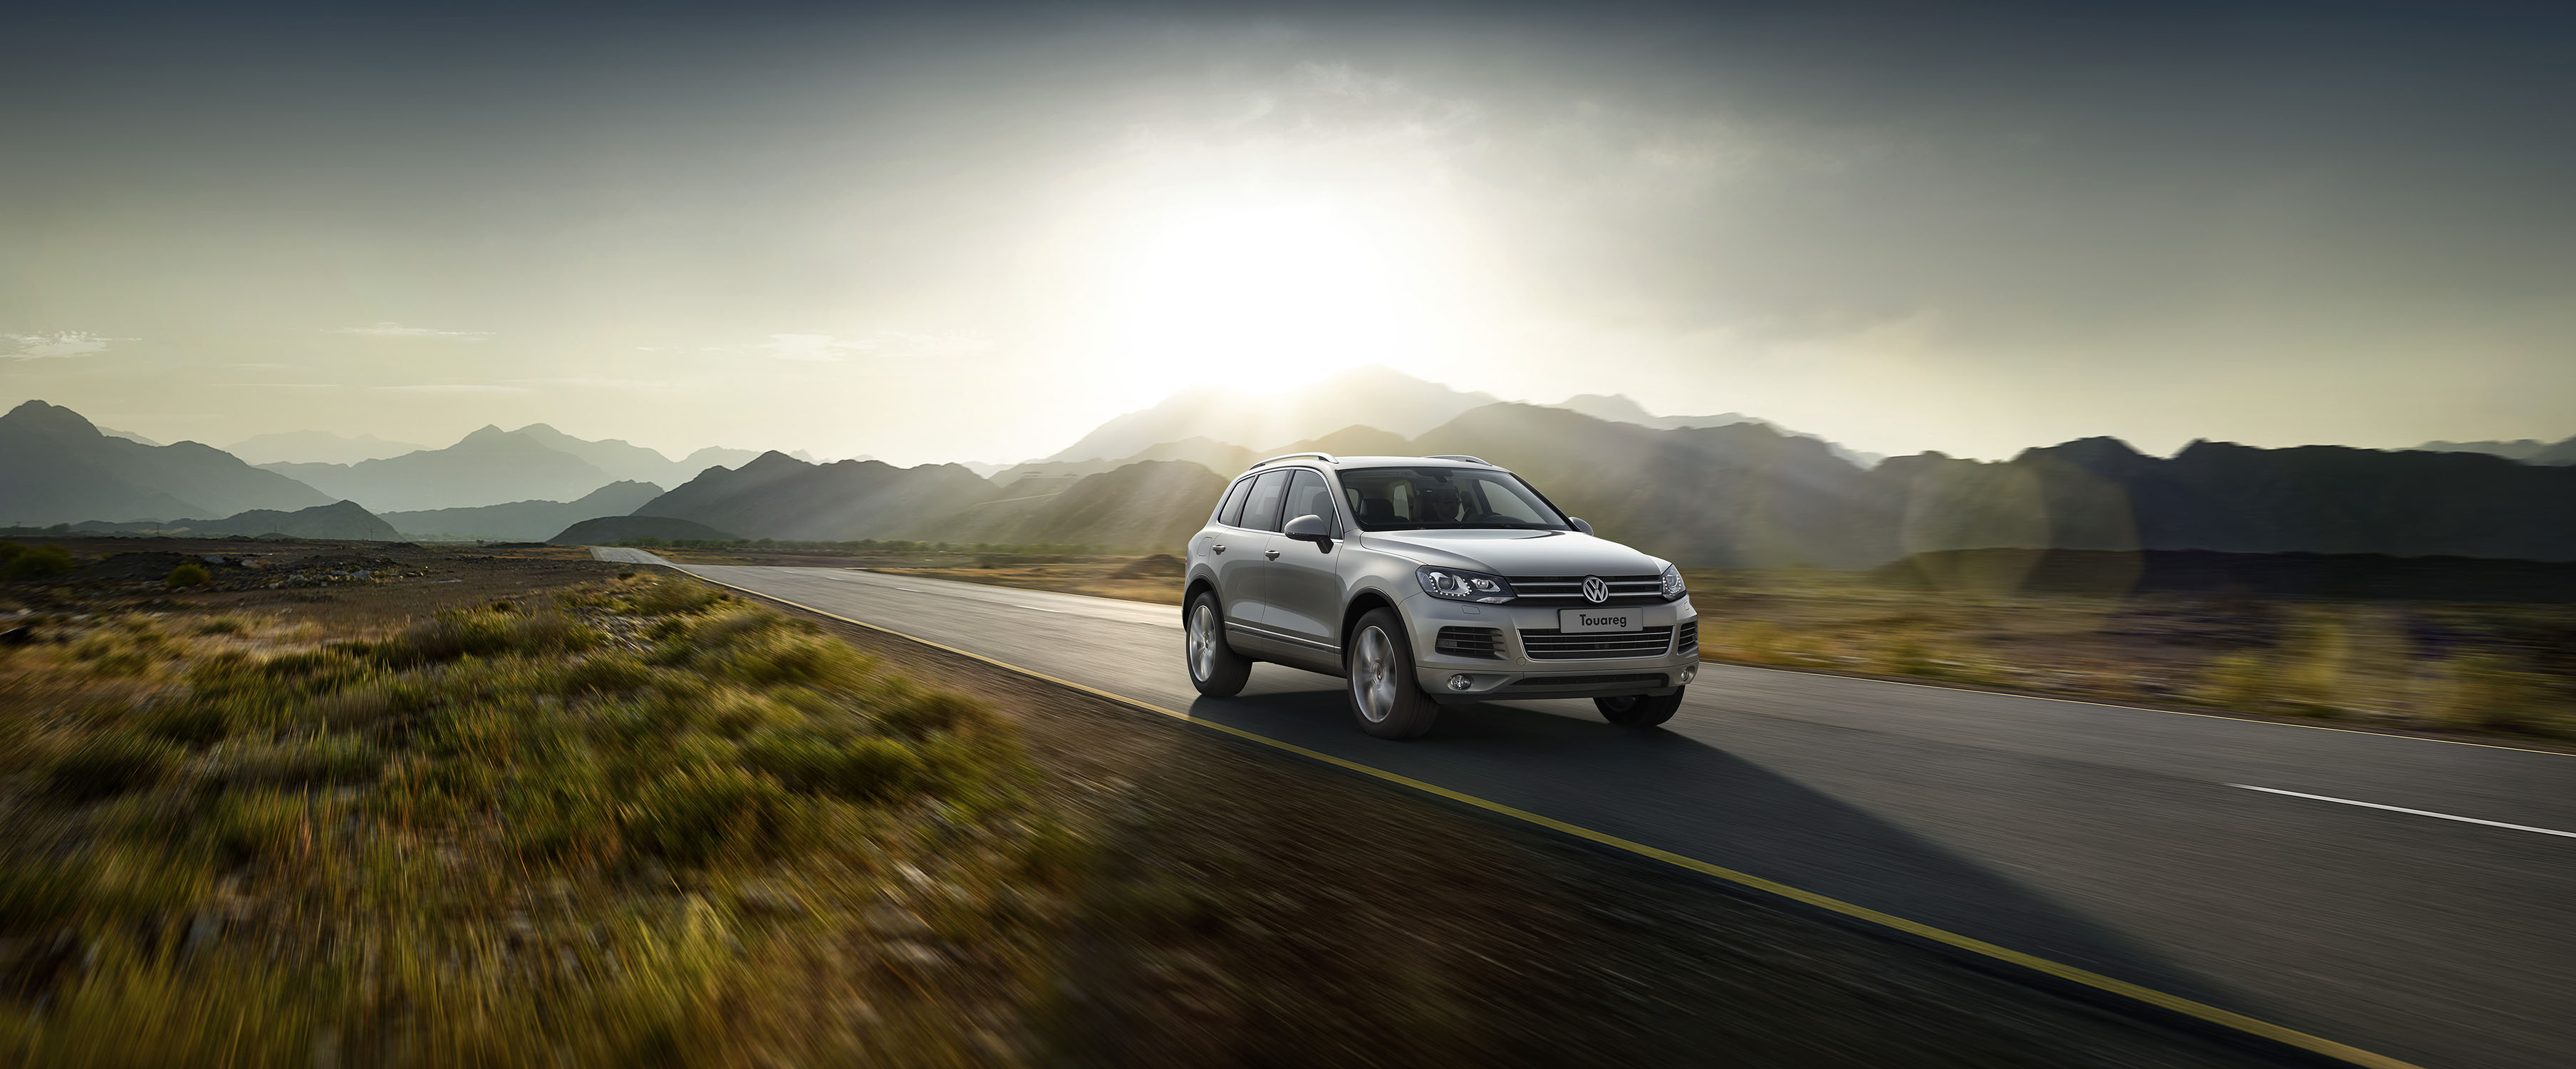 Client: Volkswagen Dubai | Photographer: Simon Puschmann